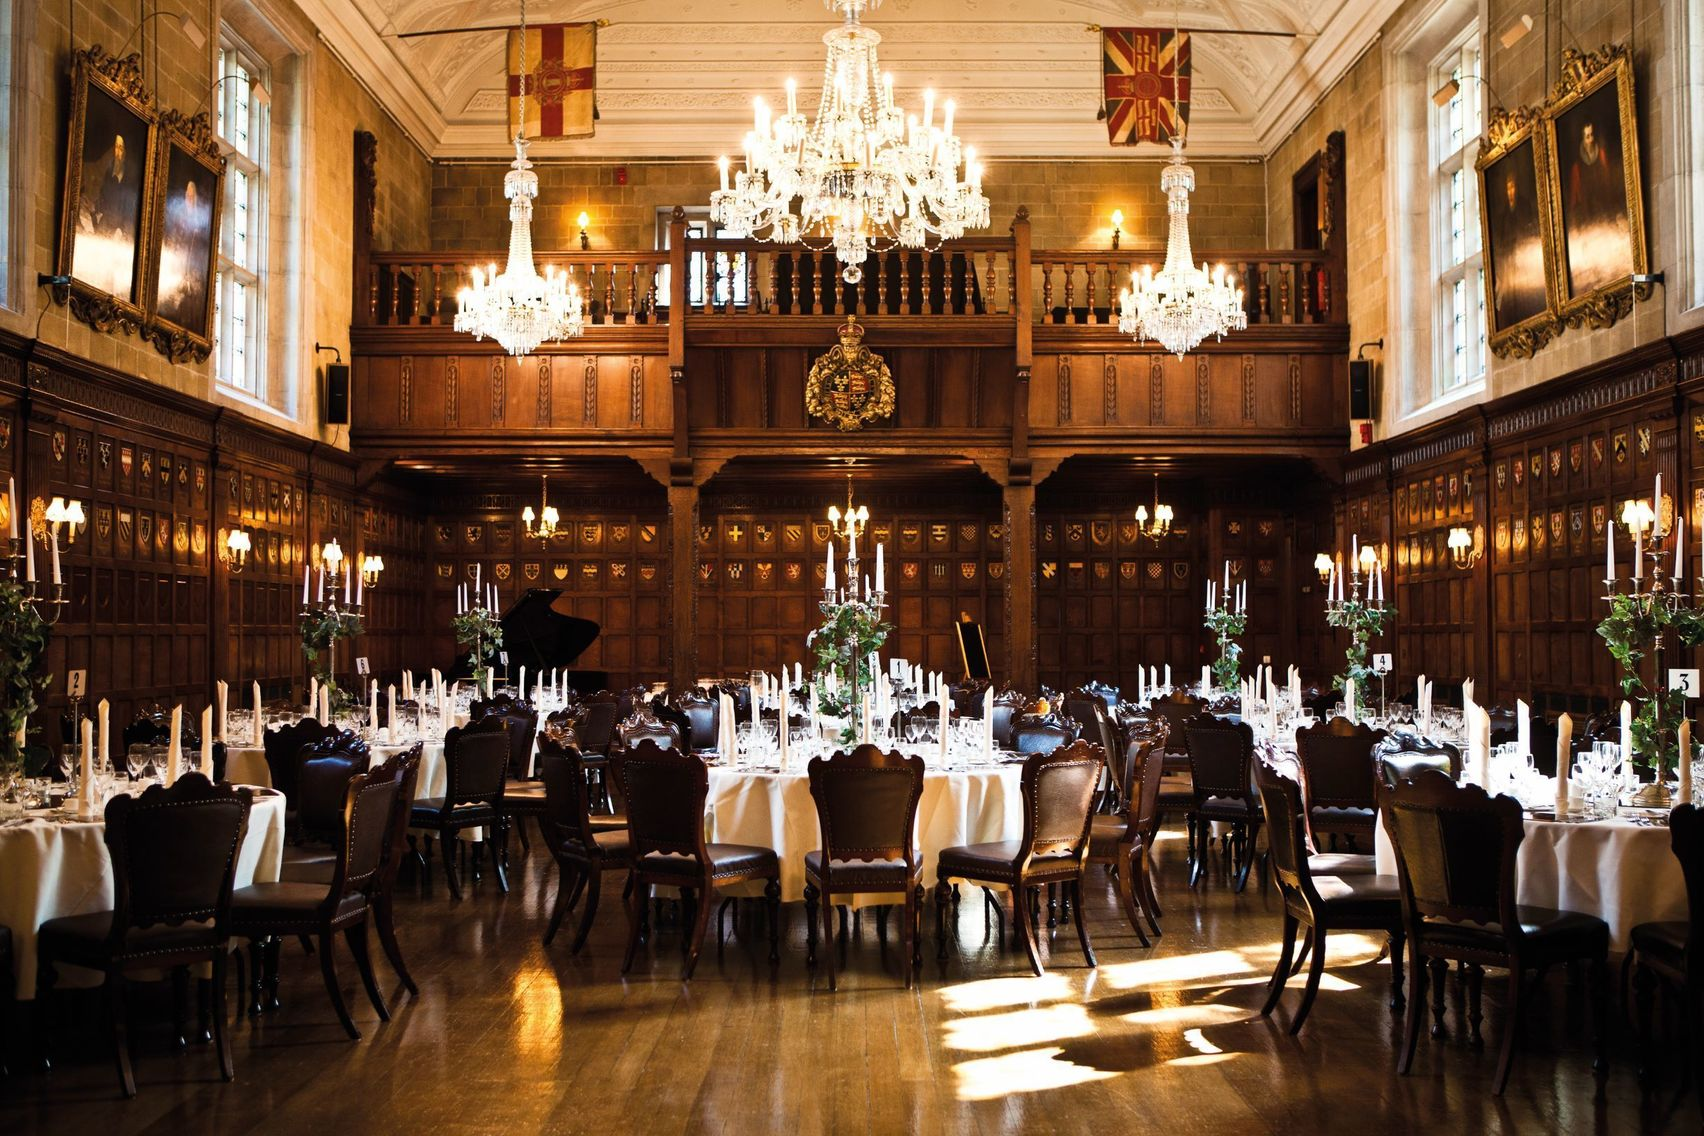 the Banqueting Hall, Ironmongers' Hall